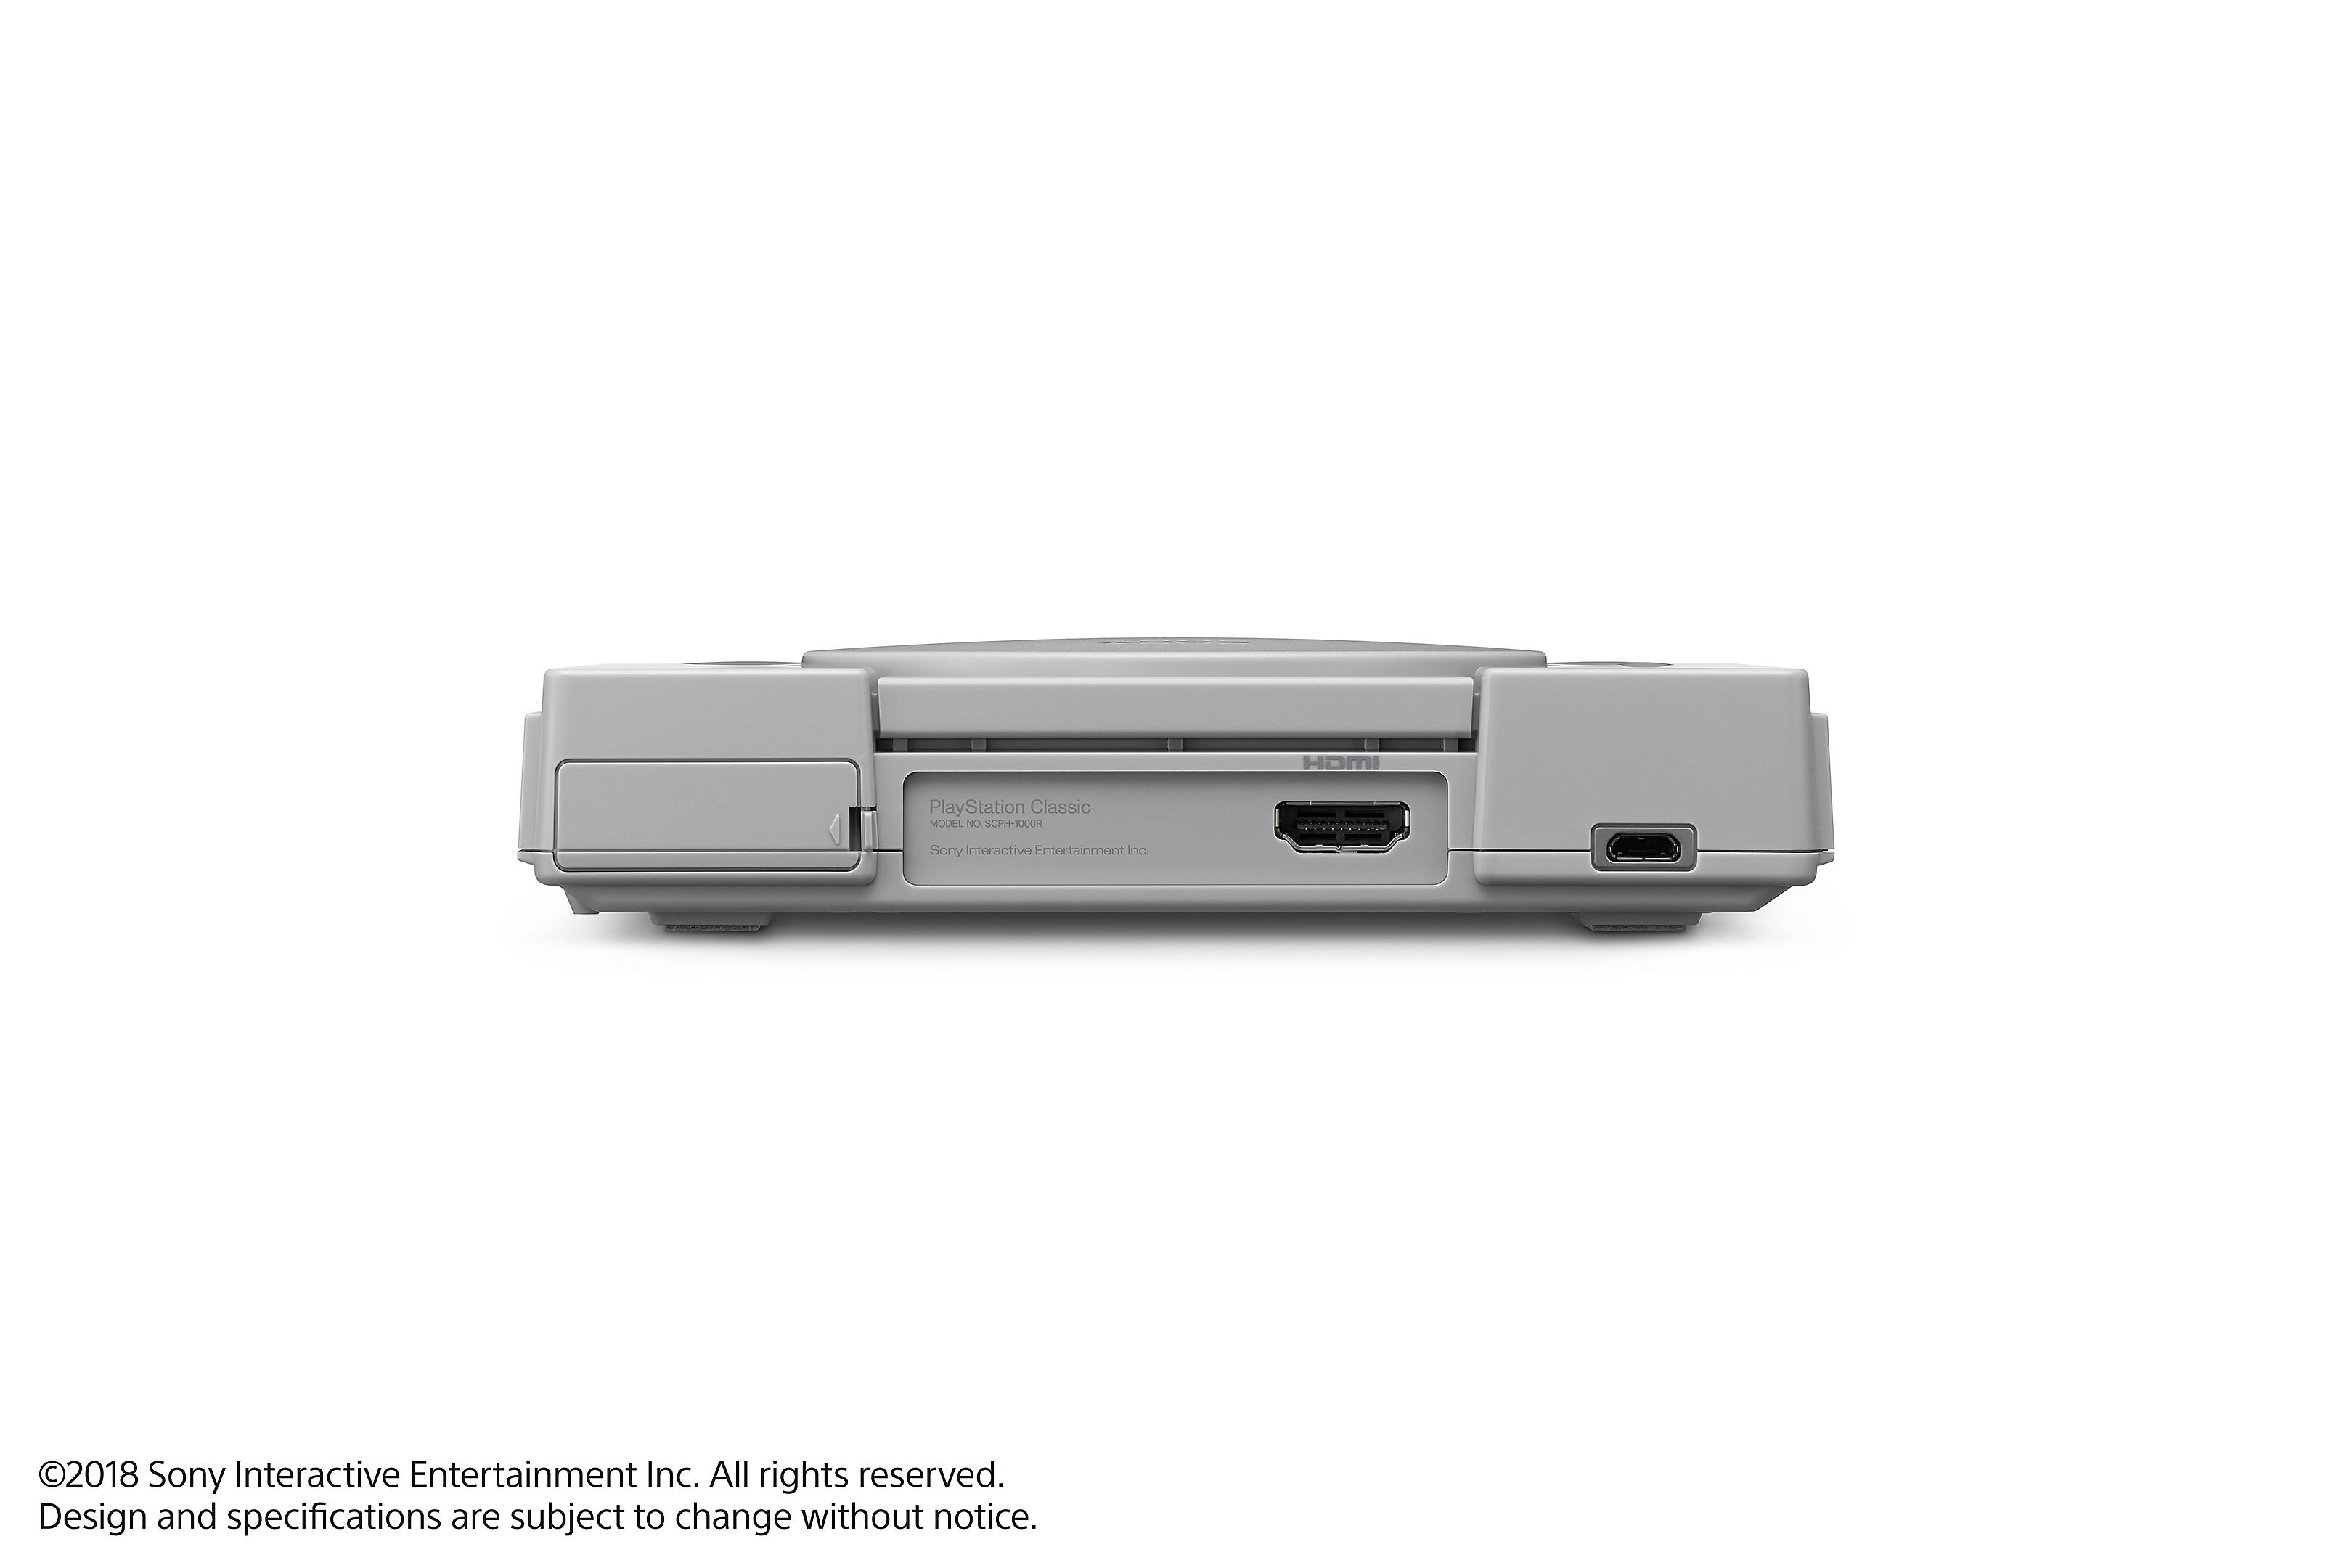 PlayStation Classic - PlayStation